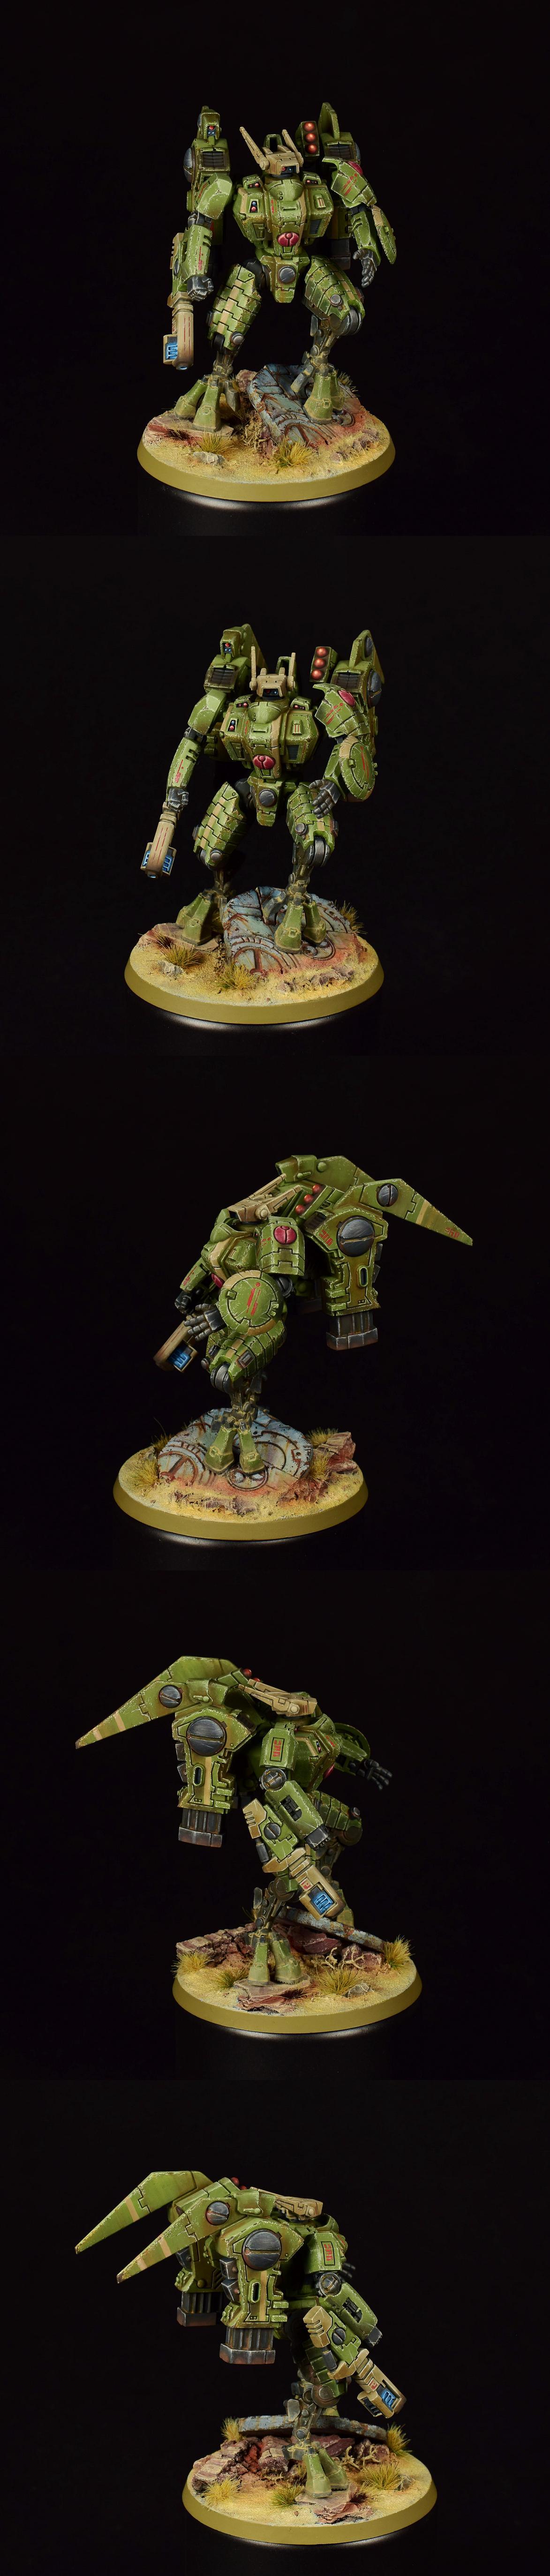 Commander, Tau, Warhammer 40,000, Weathered